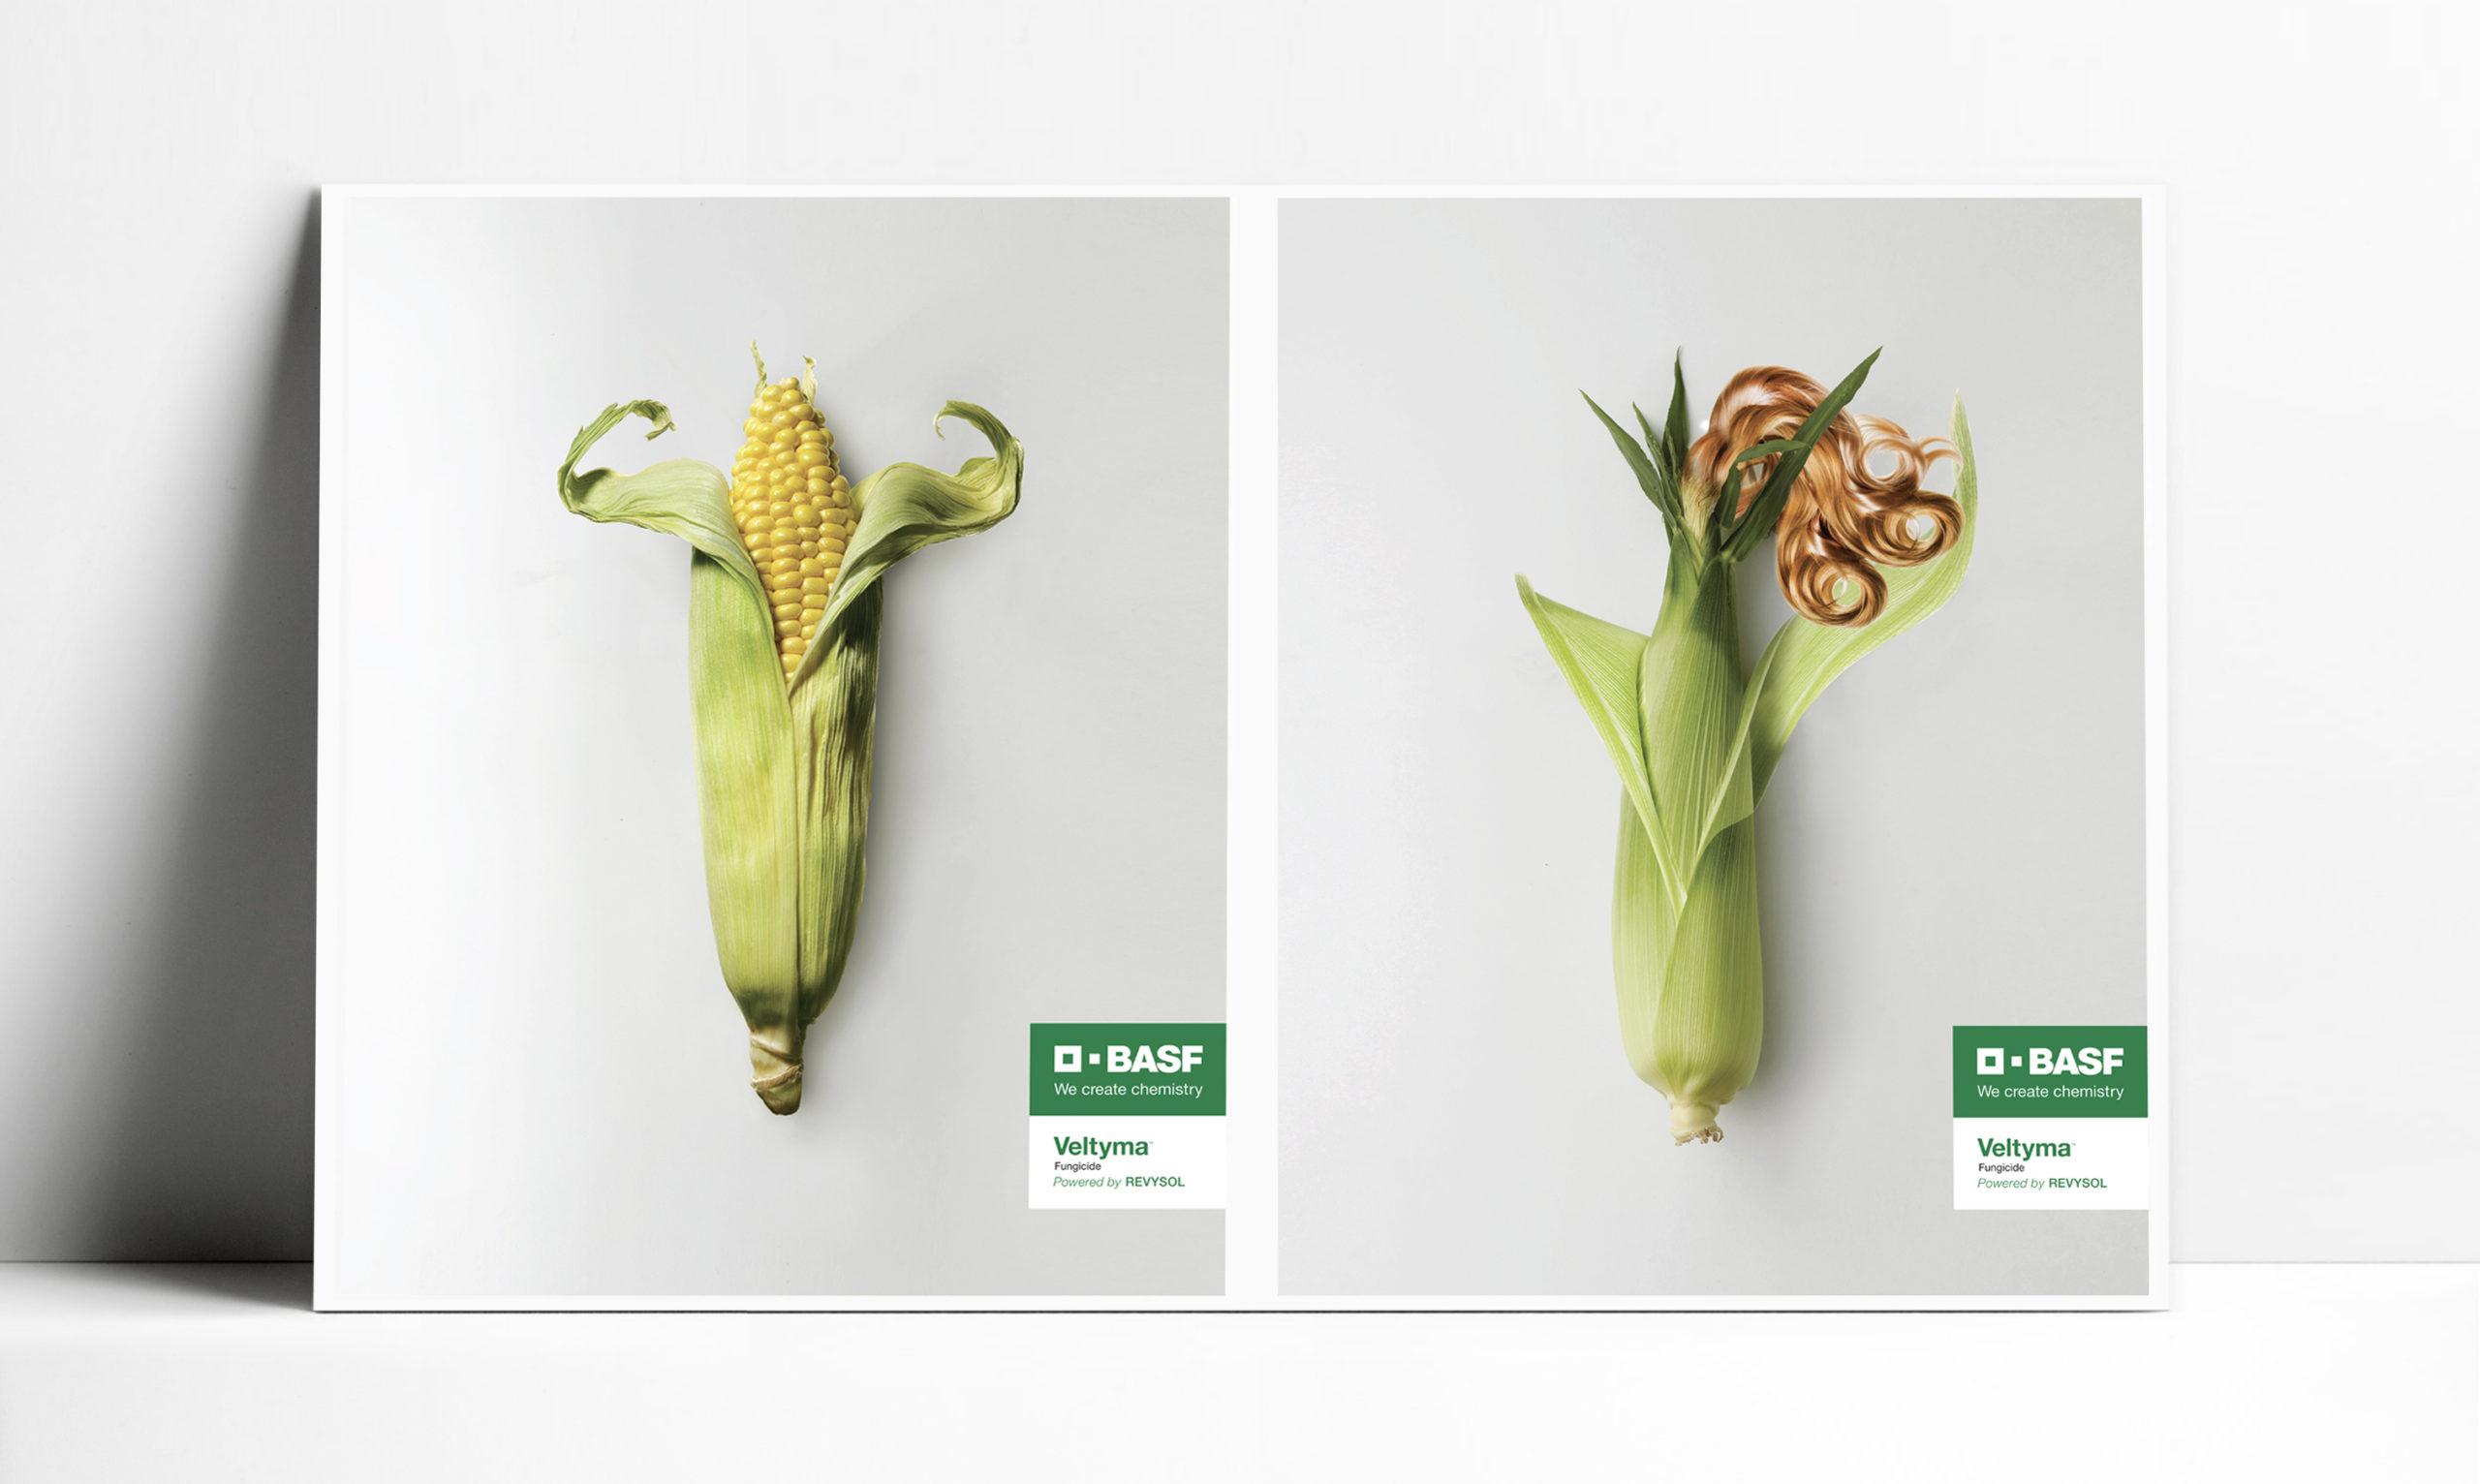 BASF_PresoAds_CornStrong